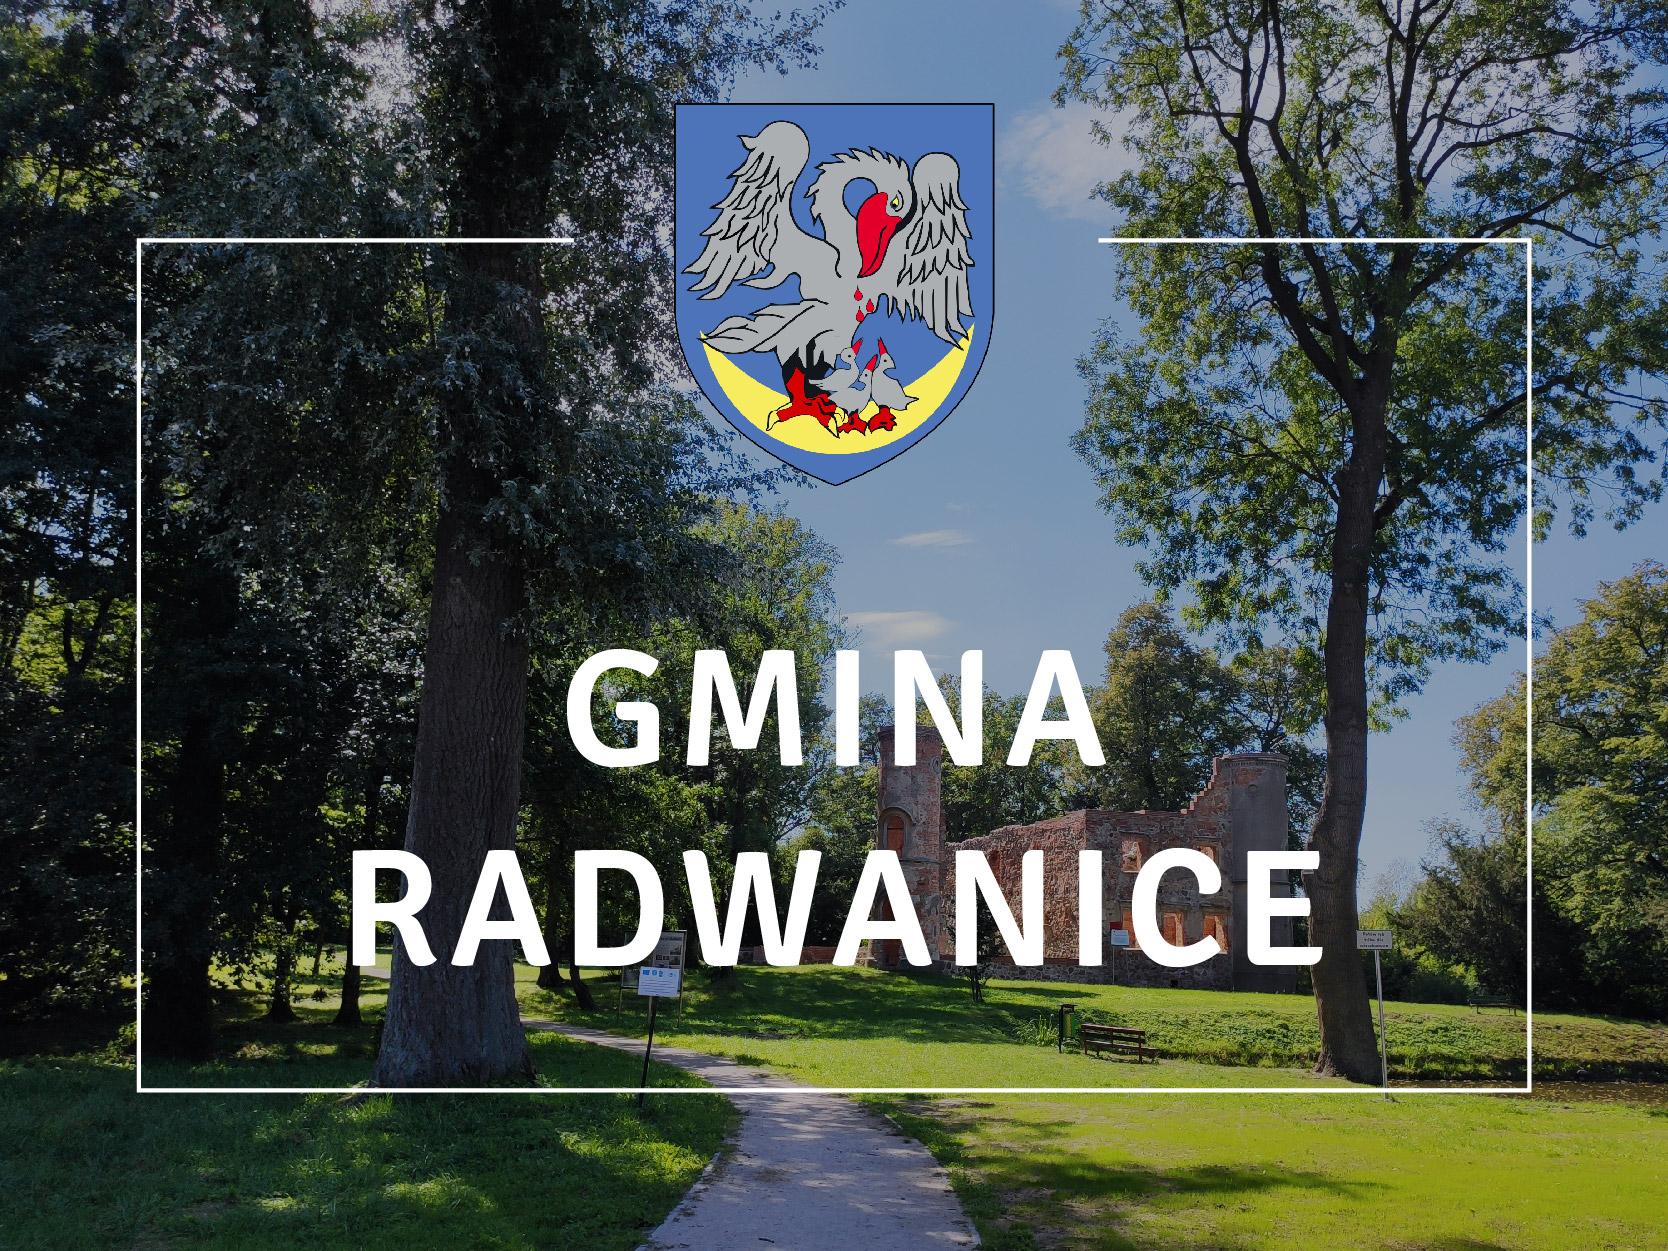 Gmina Radwanice